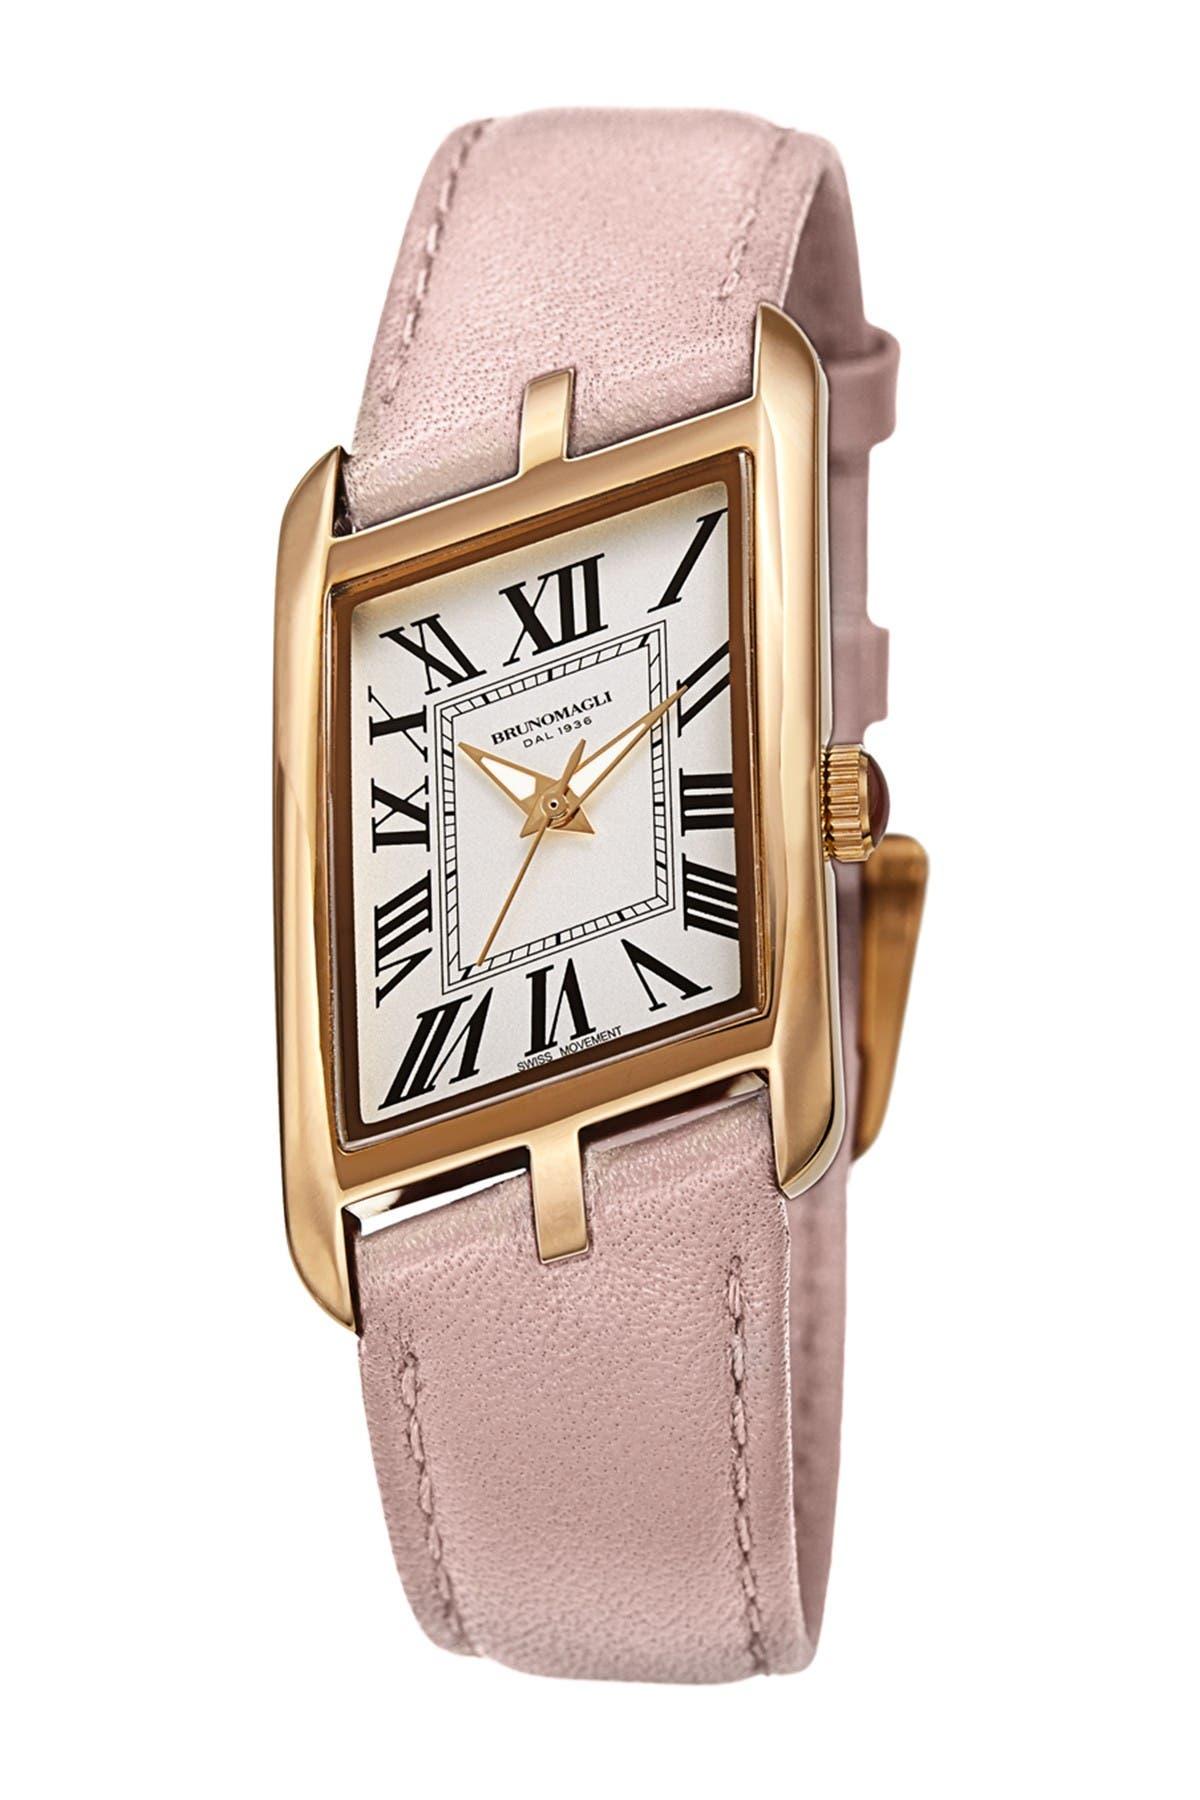 Image of Bruno Magli Women's Sofia 1421 Asymmetrical Case Leather Strap Watch, 24mm